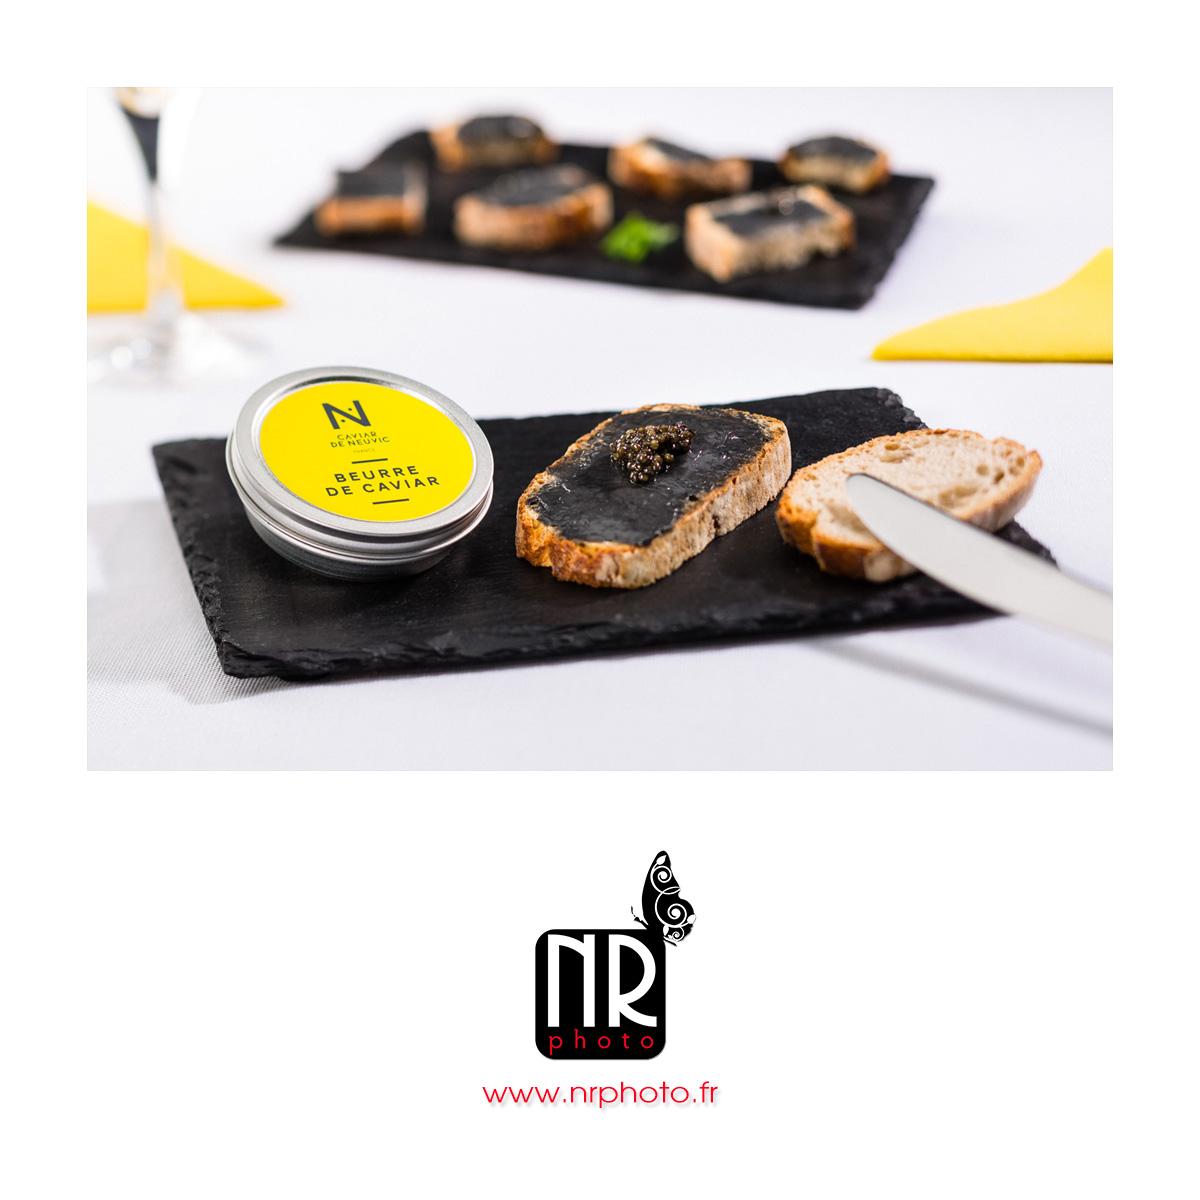 CAVIAR DE NEUVIC - Tartines de beurre de caviar